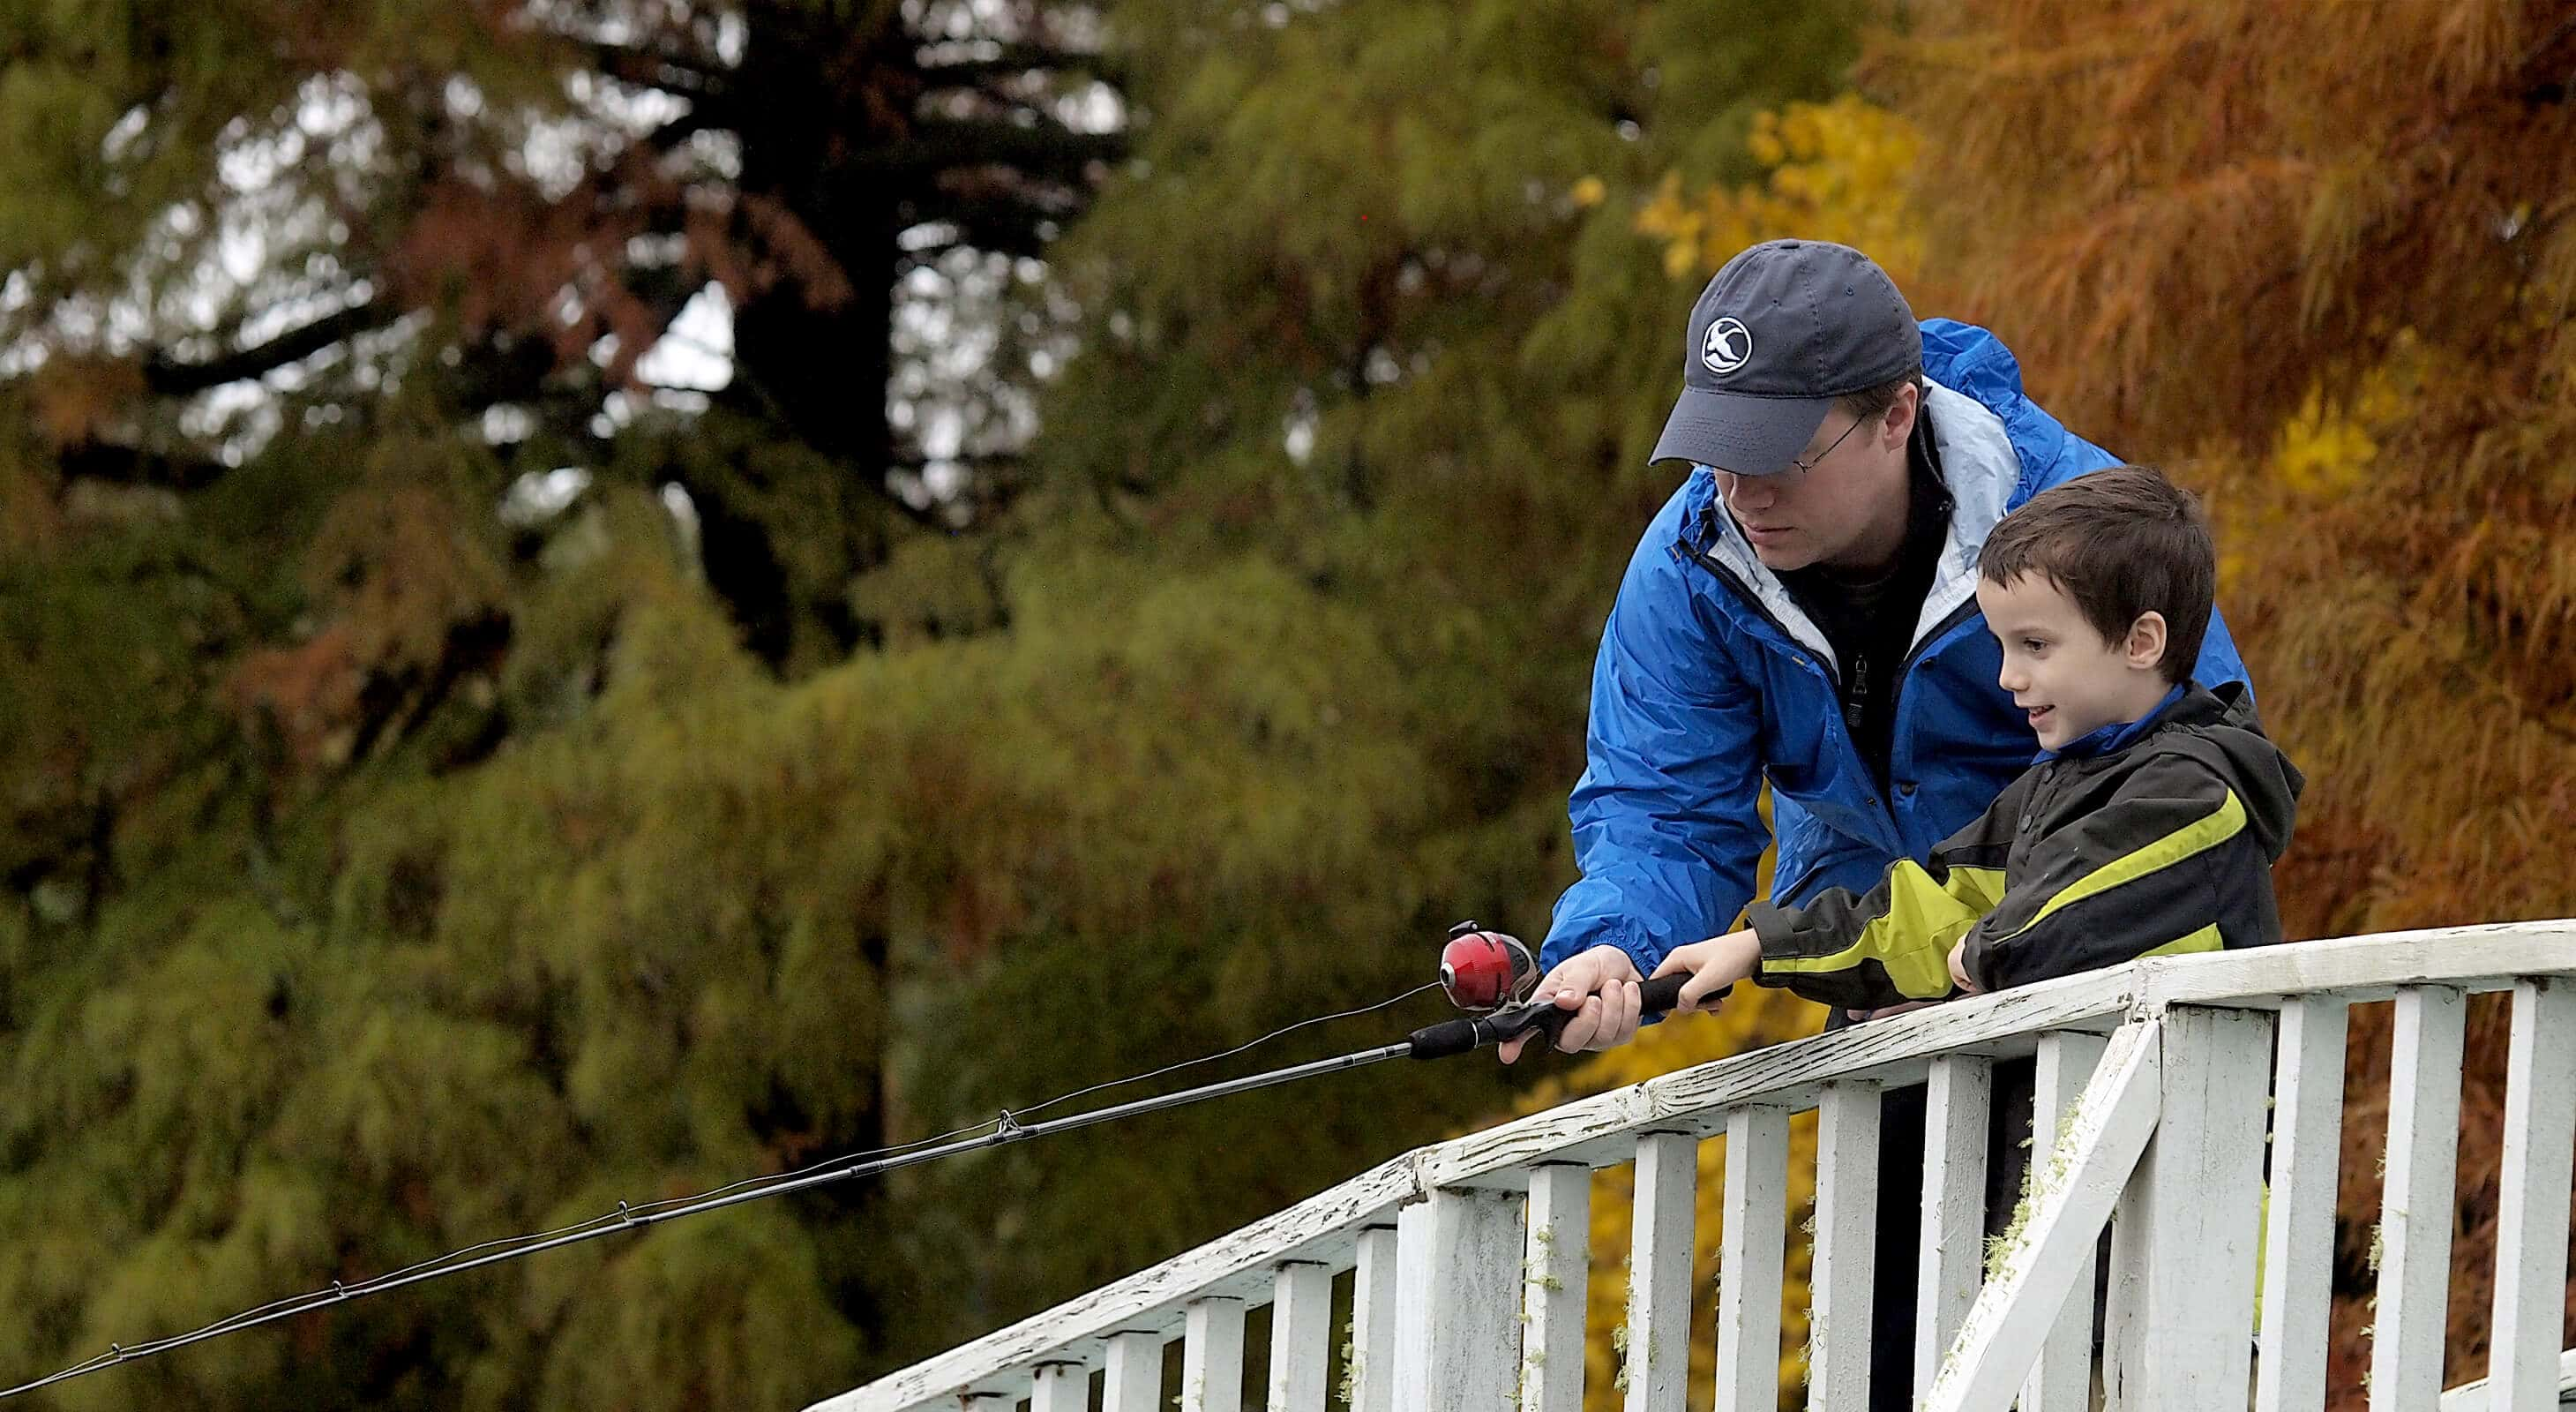 Father and son fishing at Texas lake